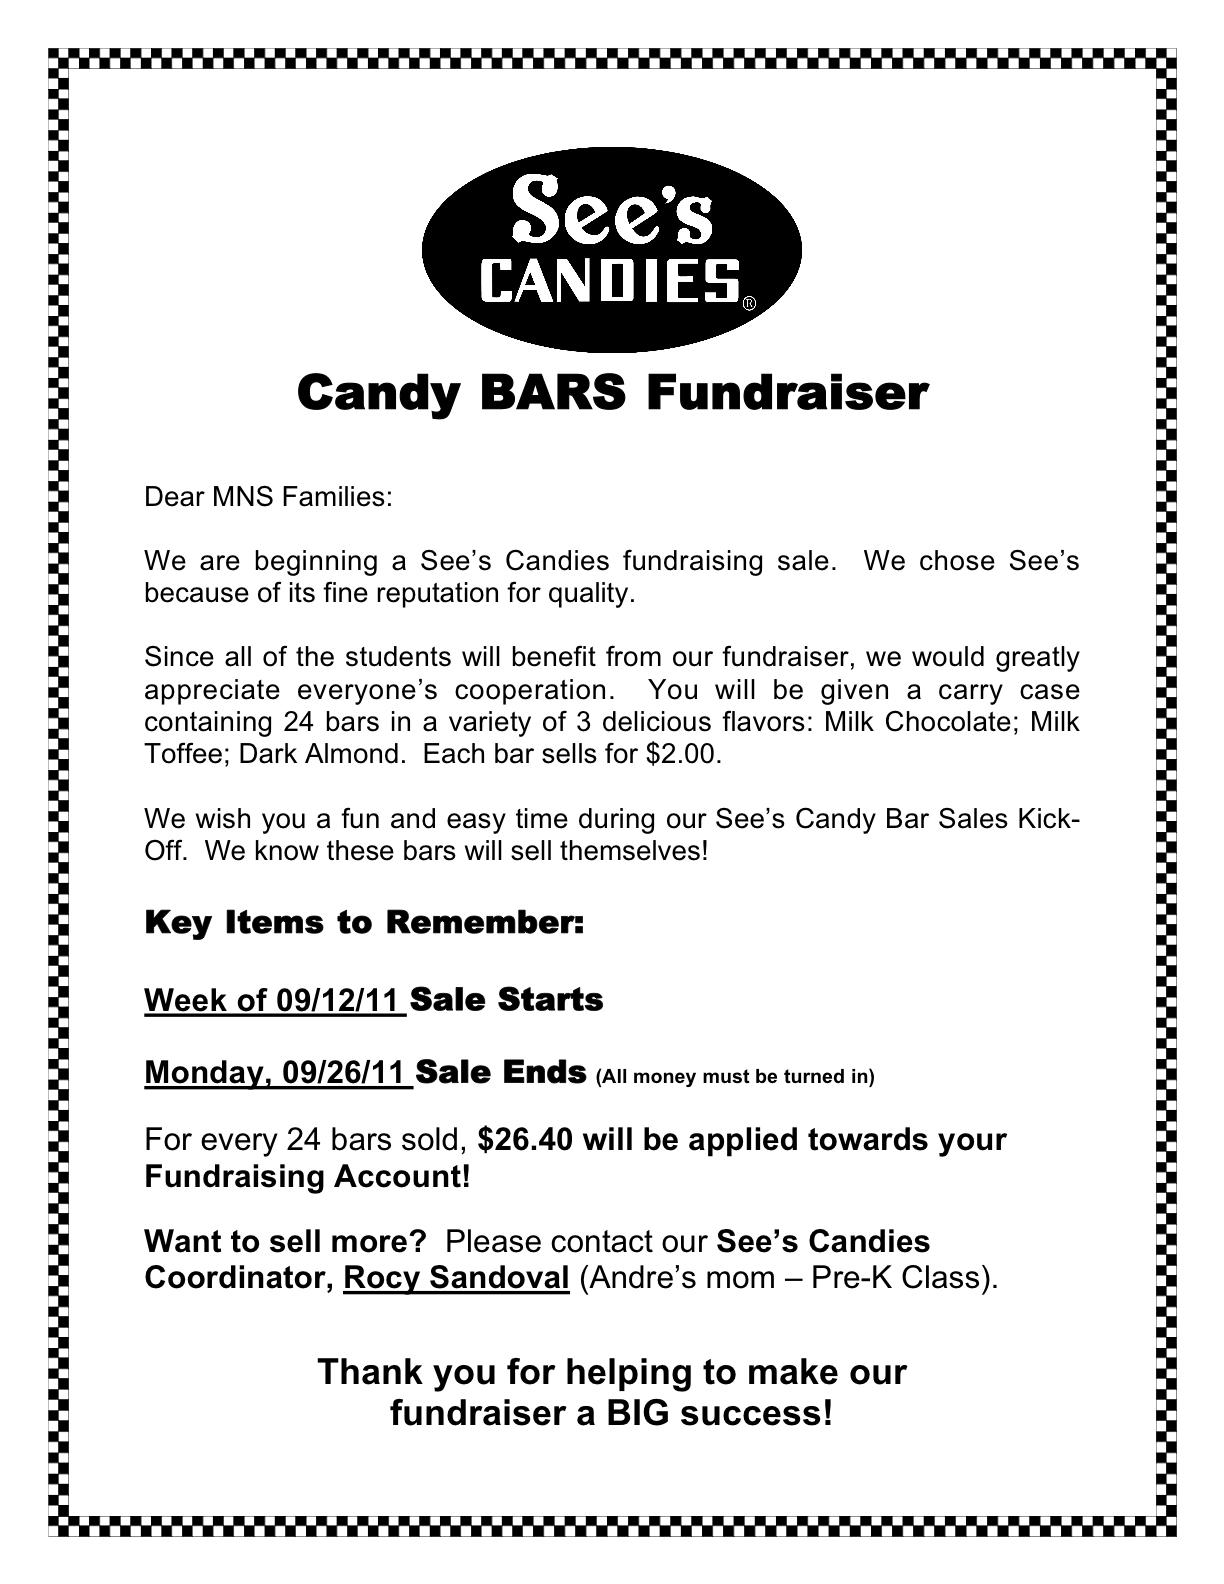 See's Candy Bars Fundraiser – Millbrae Nursery School